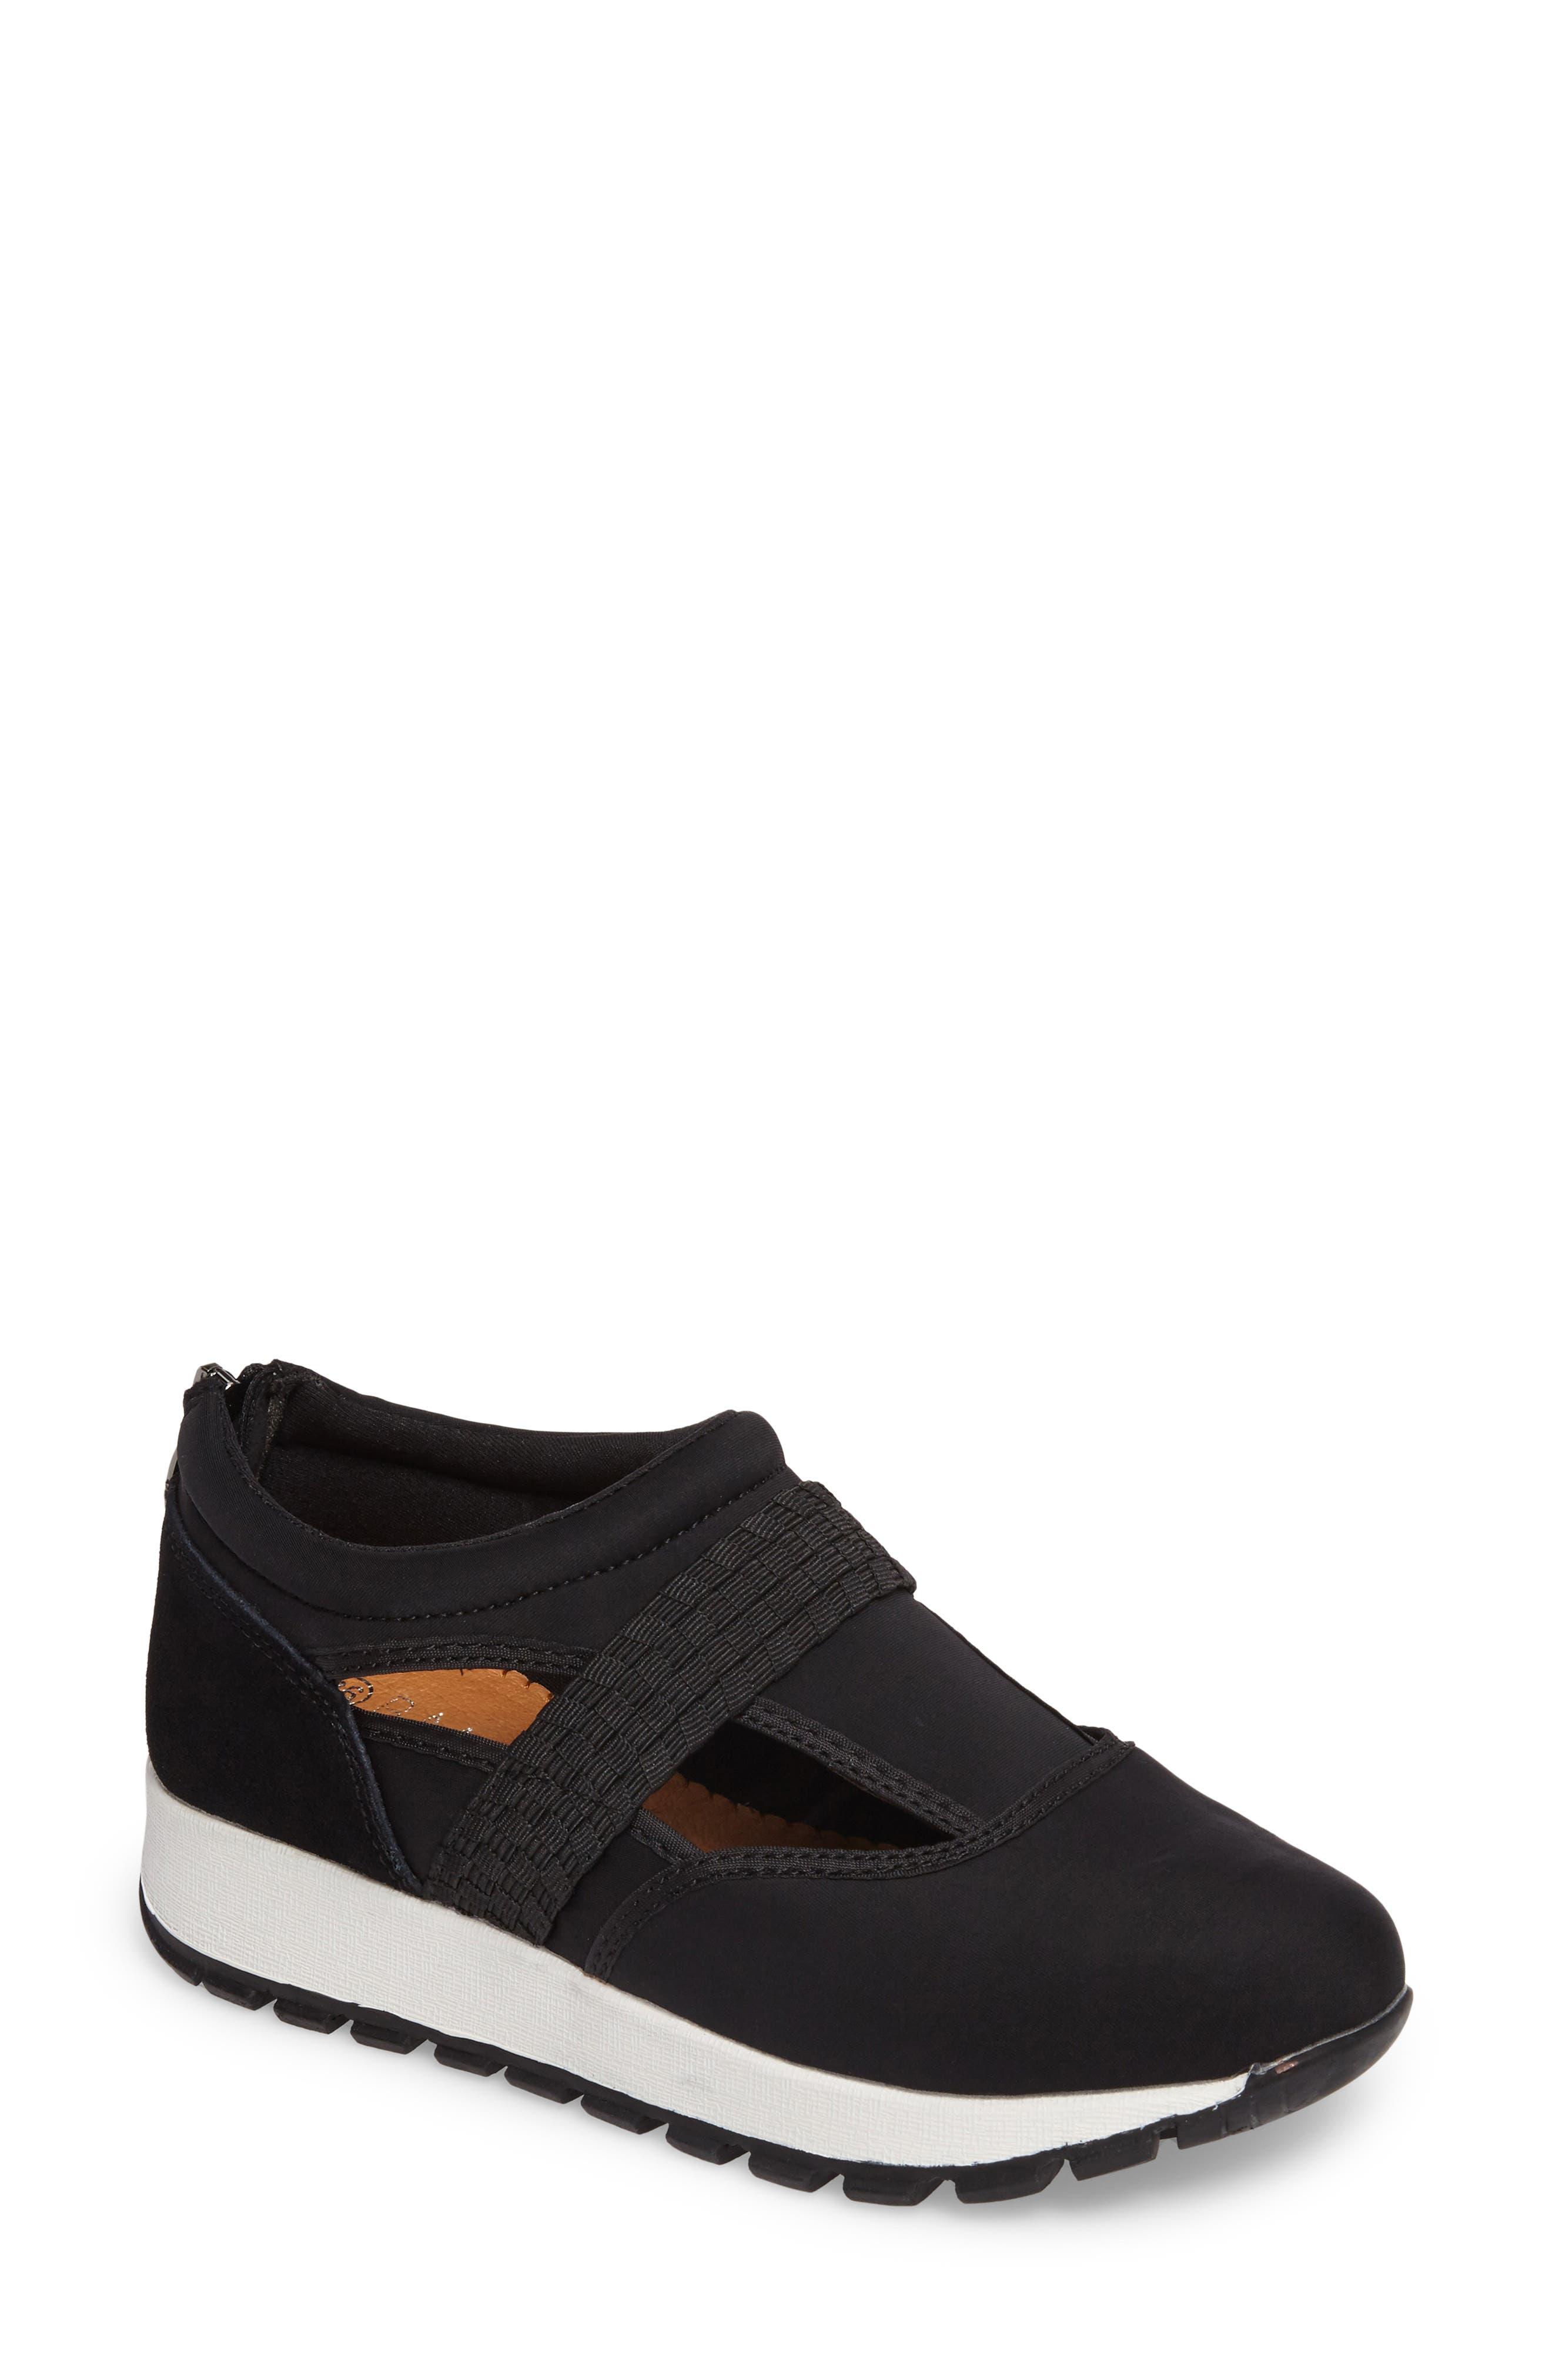 Bernie Mev Janelle Sneaker,                         Main,                         color, BLACK FABRIC